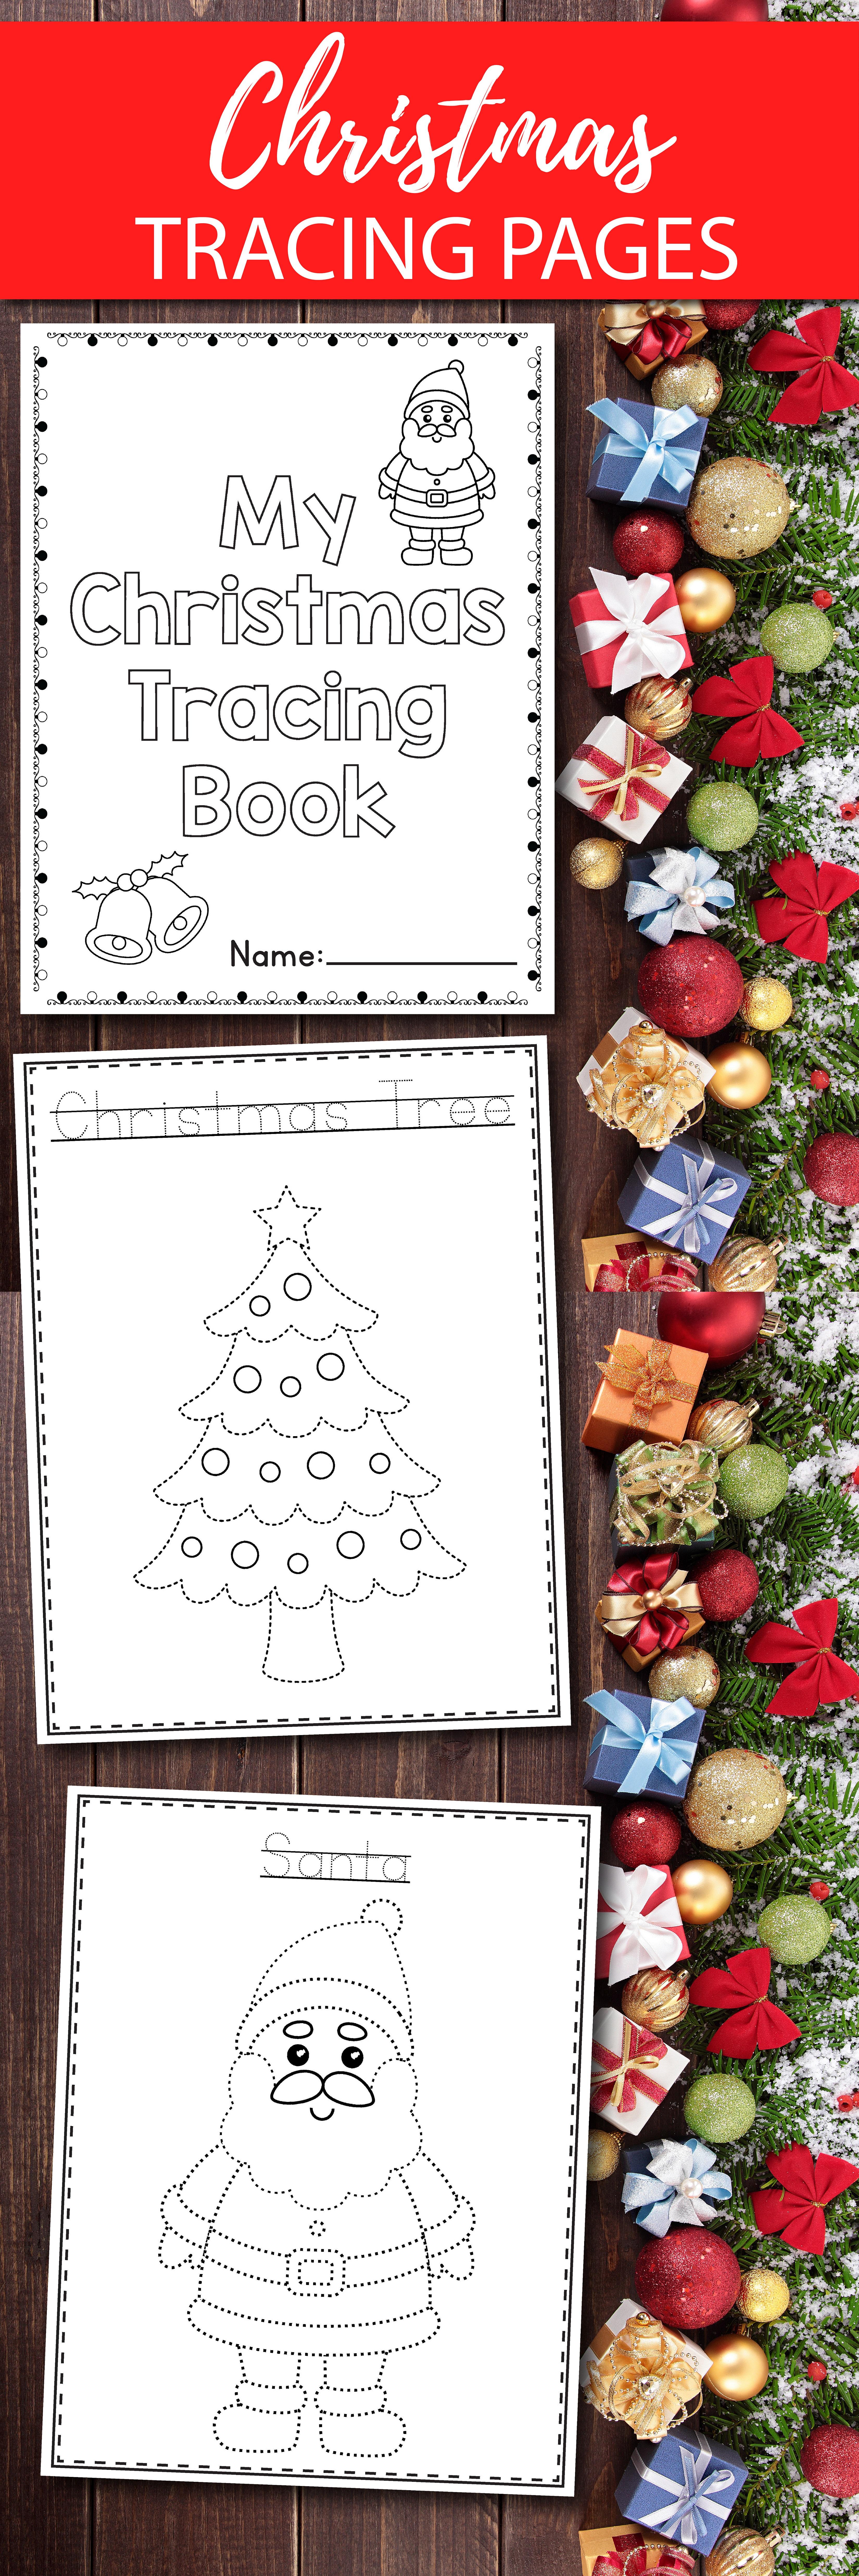 Christmas Tracing For Preschool